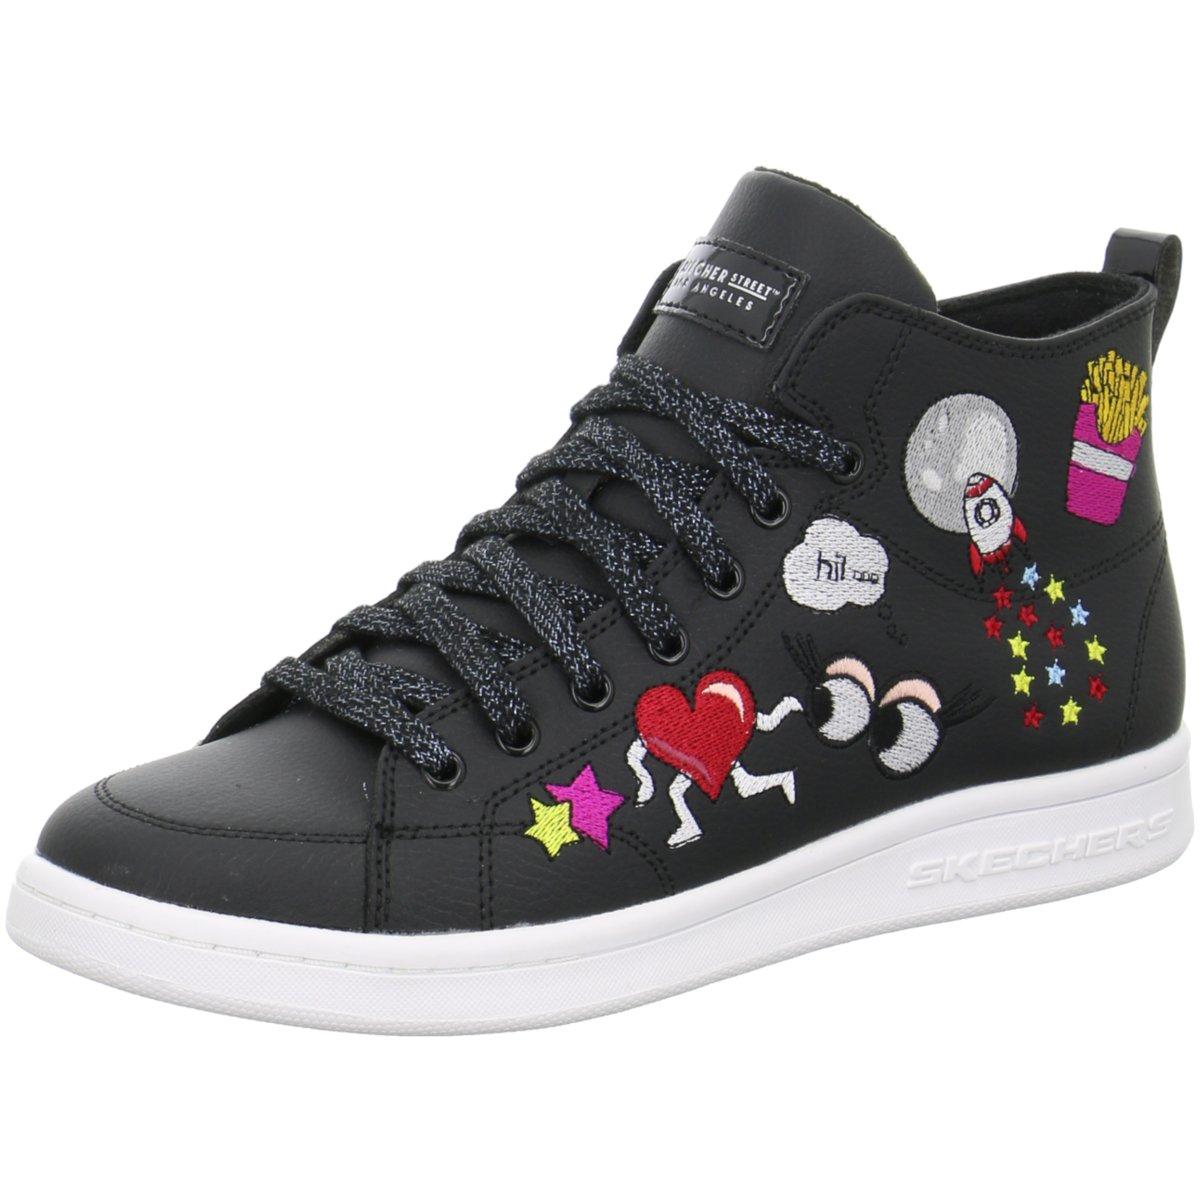 Skechers Damen Sneaker 732-BLK Schwarz 339131